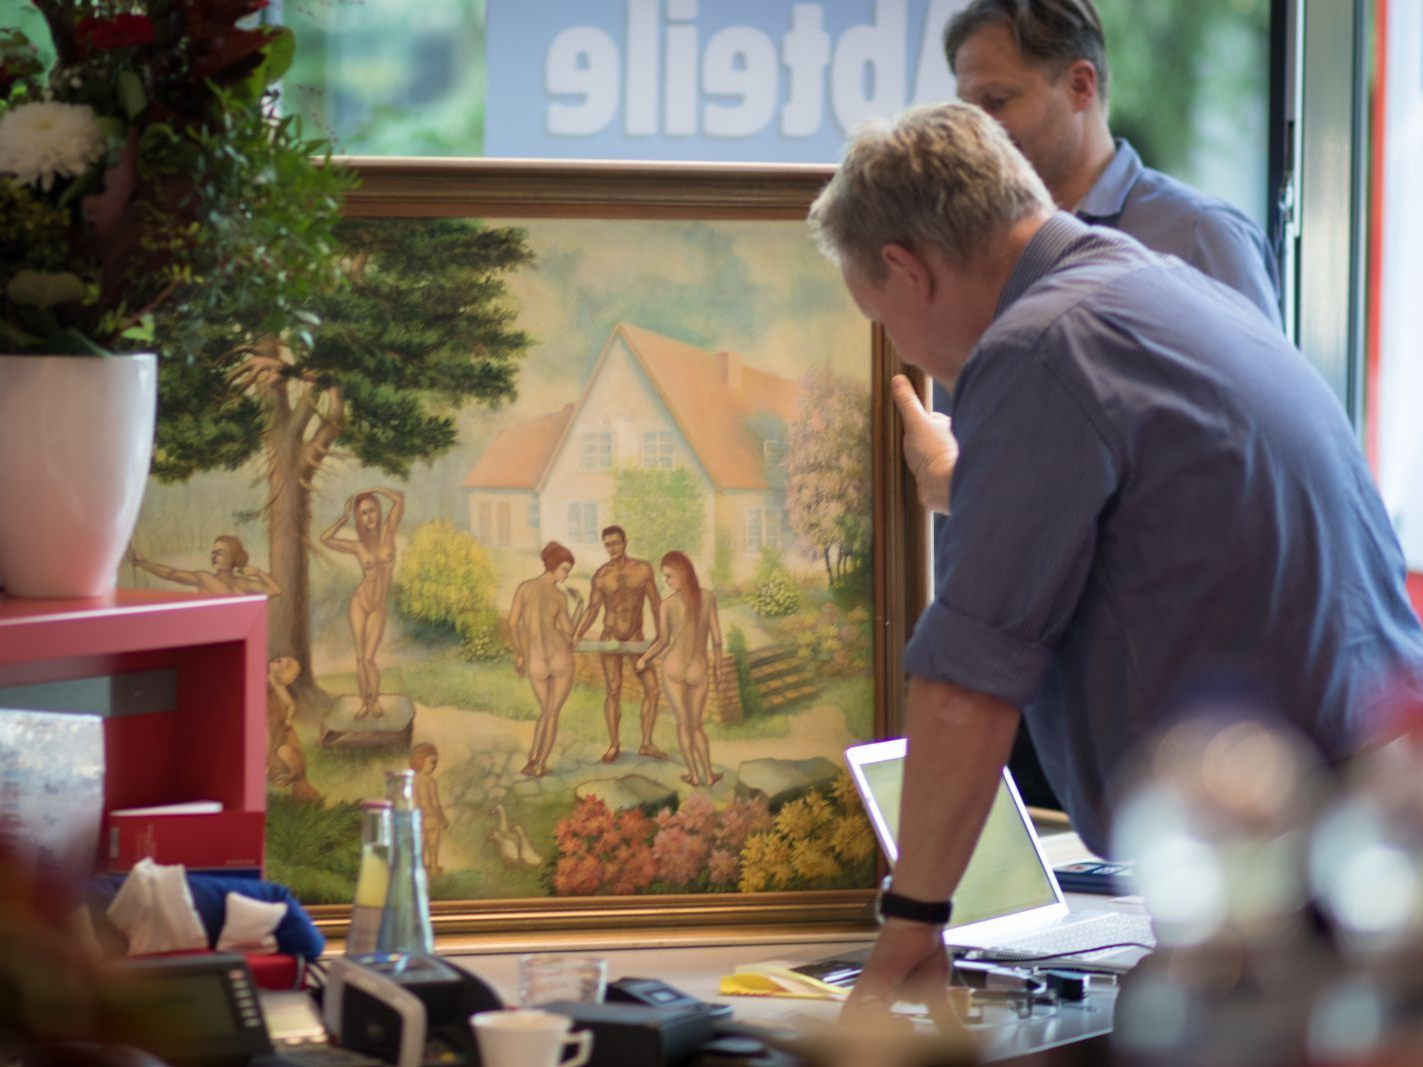 Antiquitäten Schätzen Lassen Hamburg : Wo kann man antiquitäten schätzen lassen wo kann ich einen